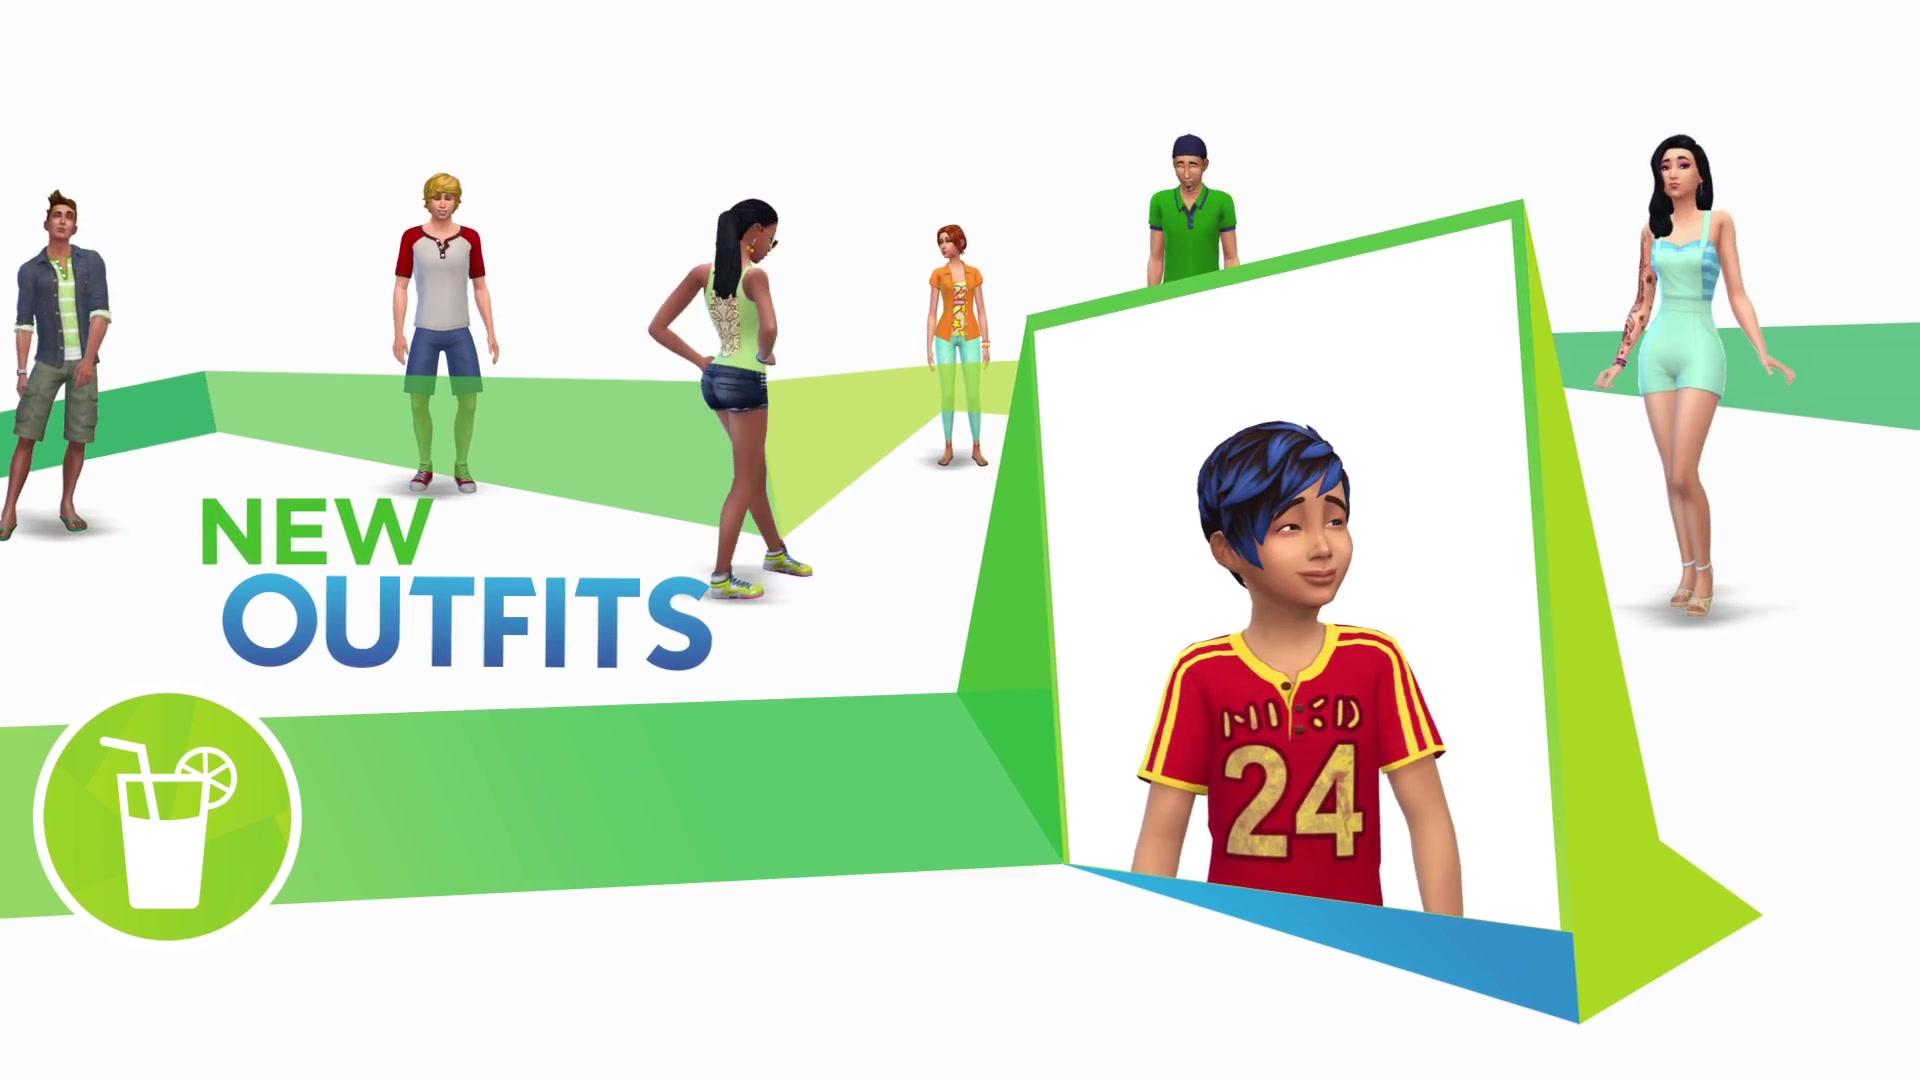 The Sims 4 Backyard Stuff- Official Trailer 1646